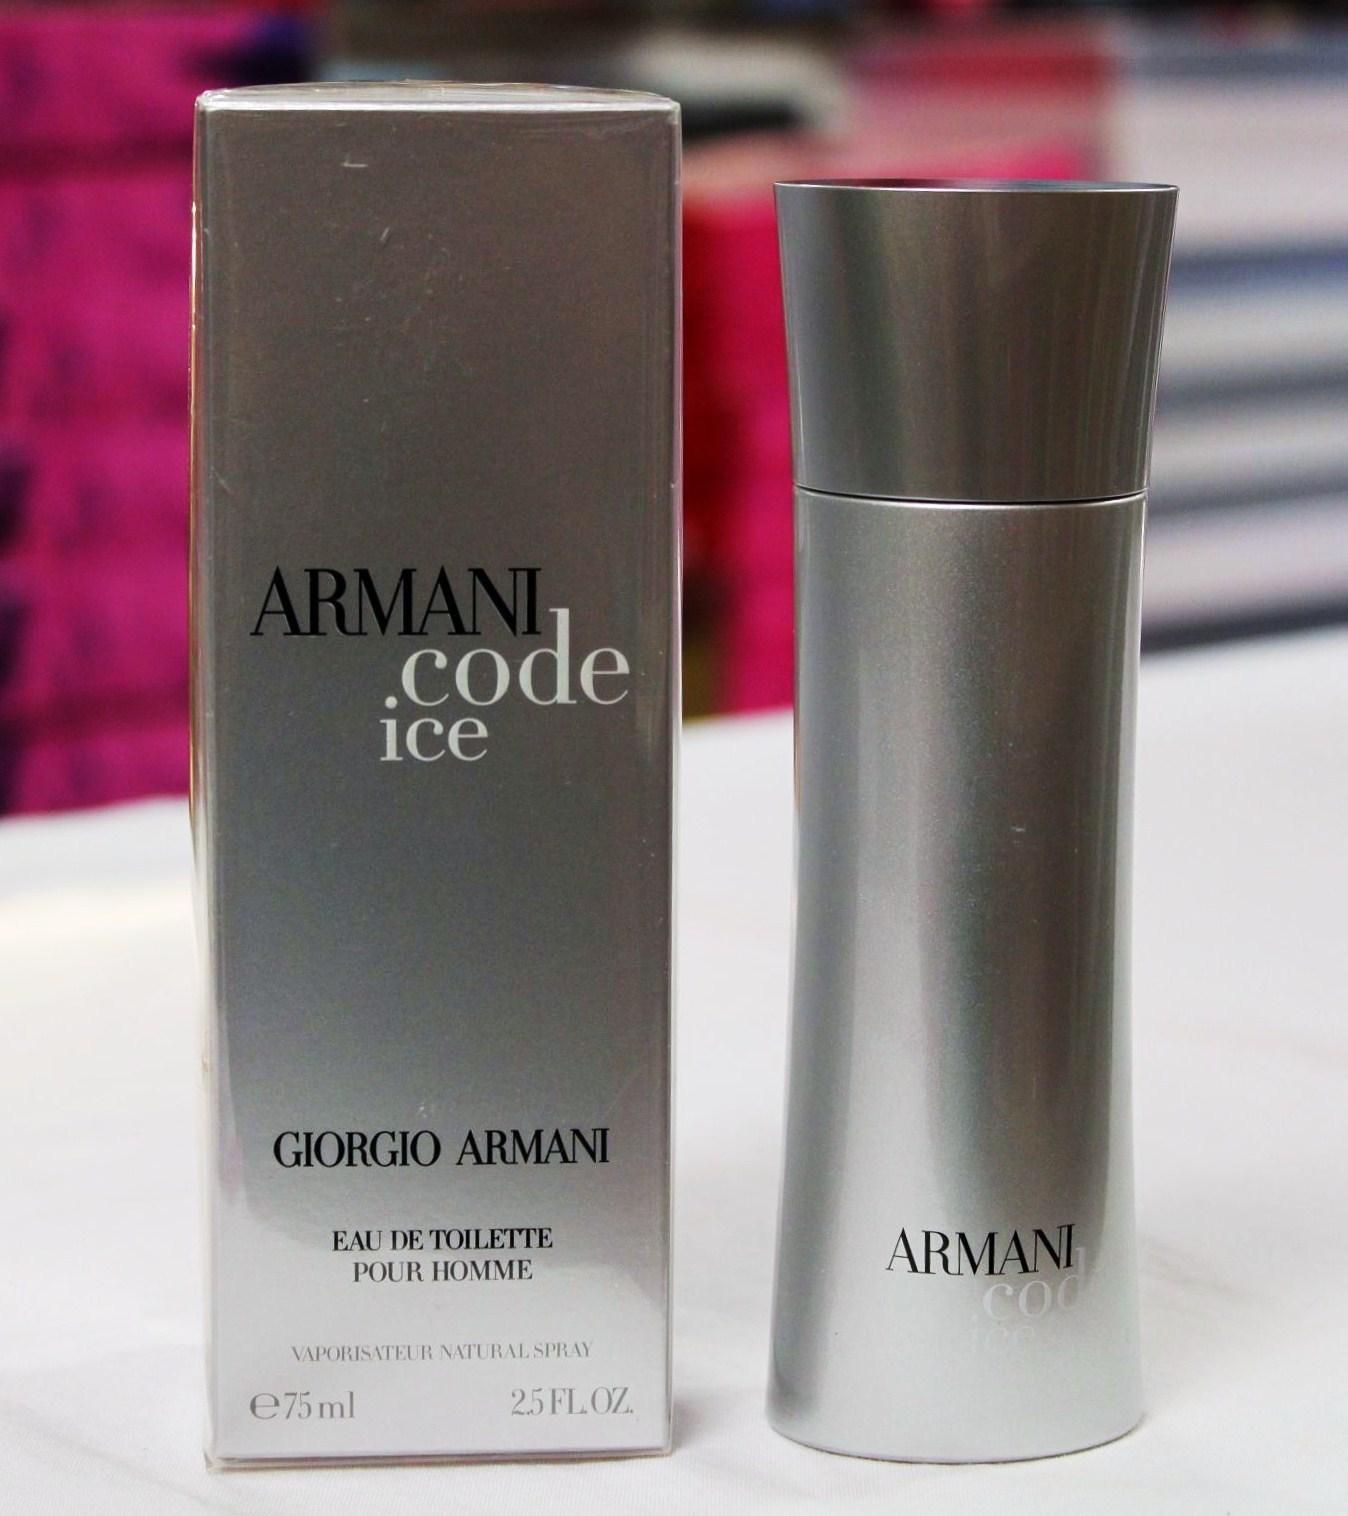 f5c409b4f3ed M armani code ice 2.5. M armani code ice 2.5. Previous. Armani Code Pour  Homme by Giorgio Armani for Men 2.5 oz/ 75 ml EDT Natural